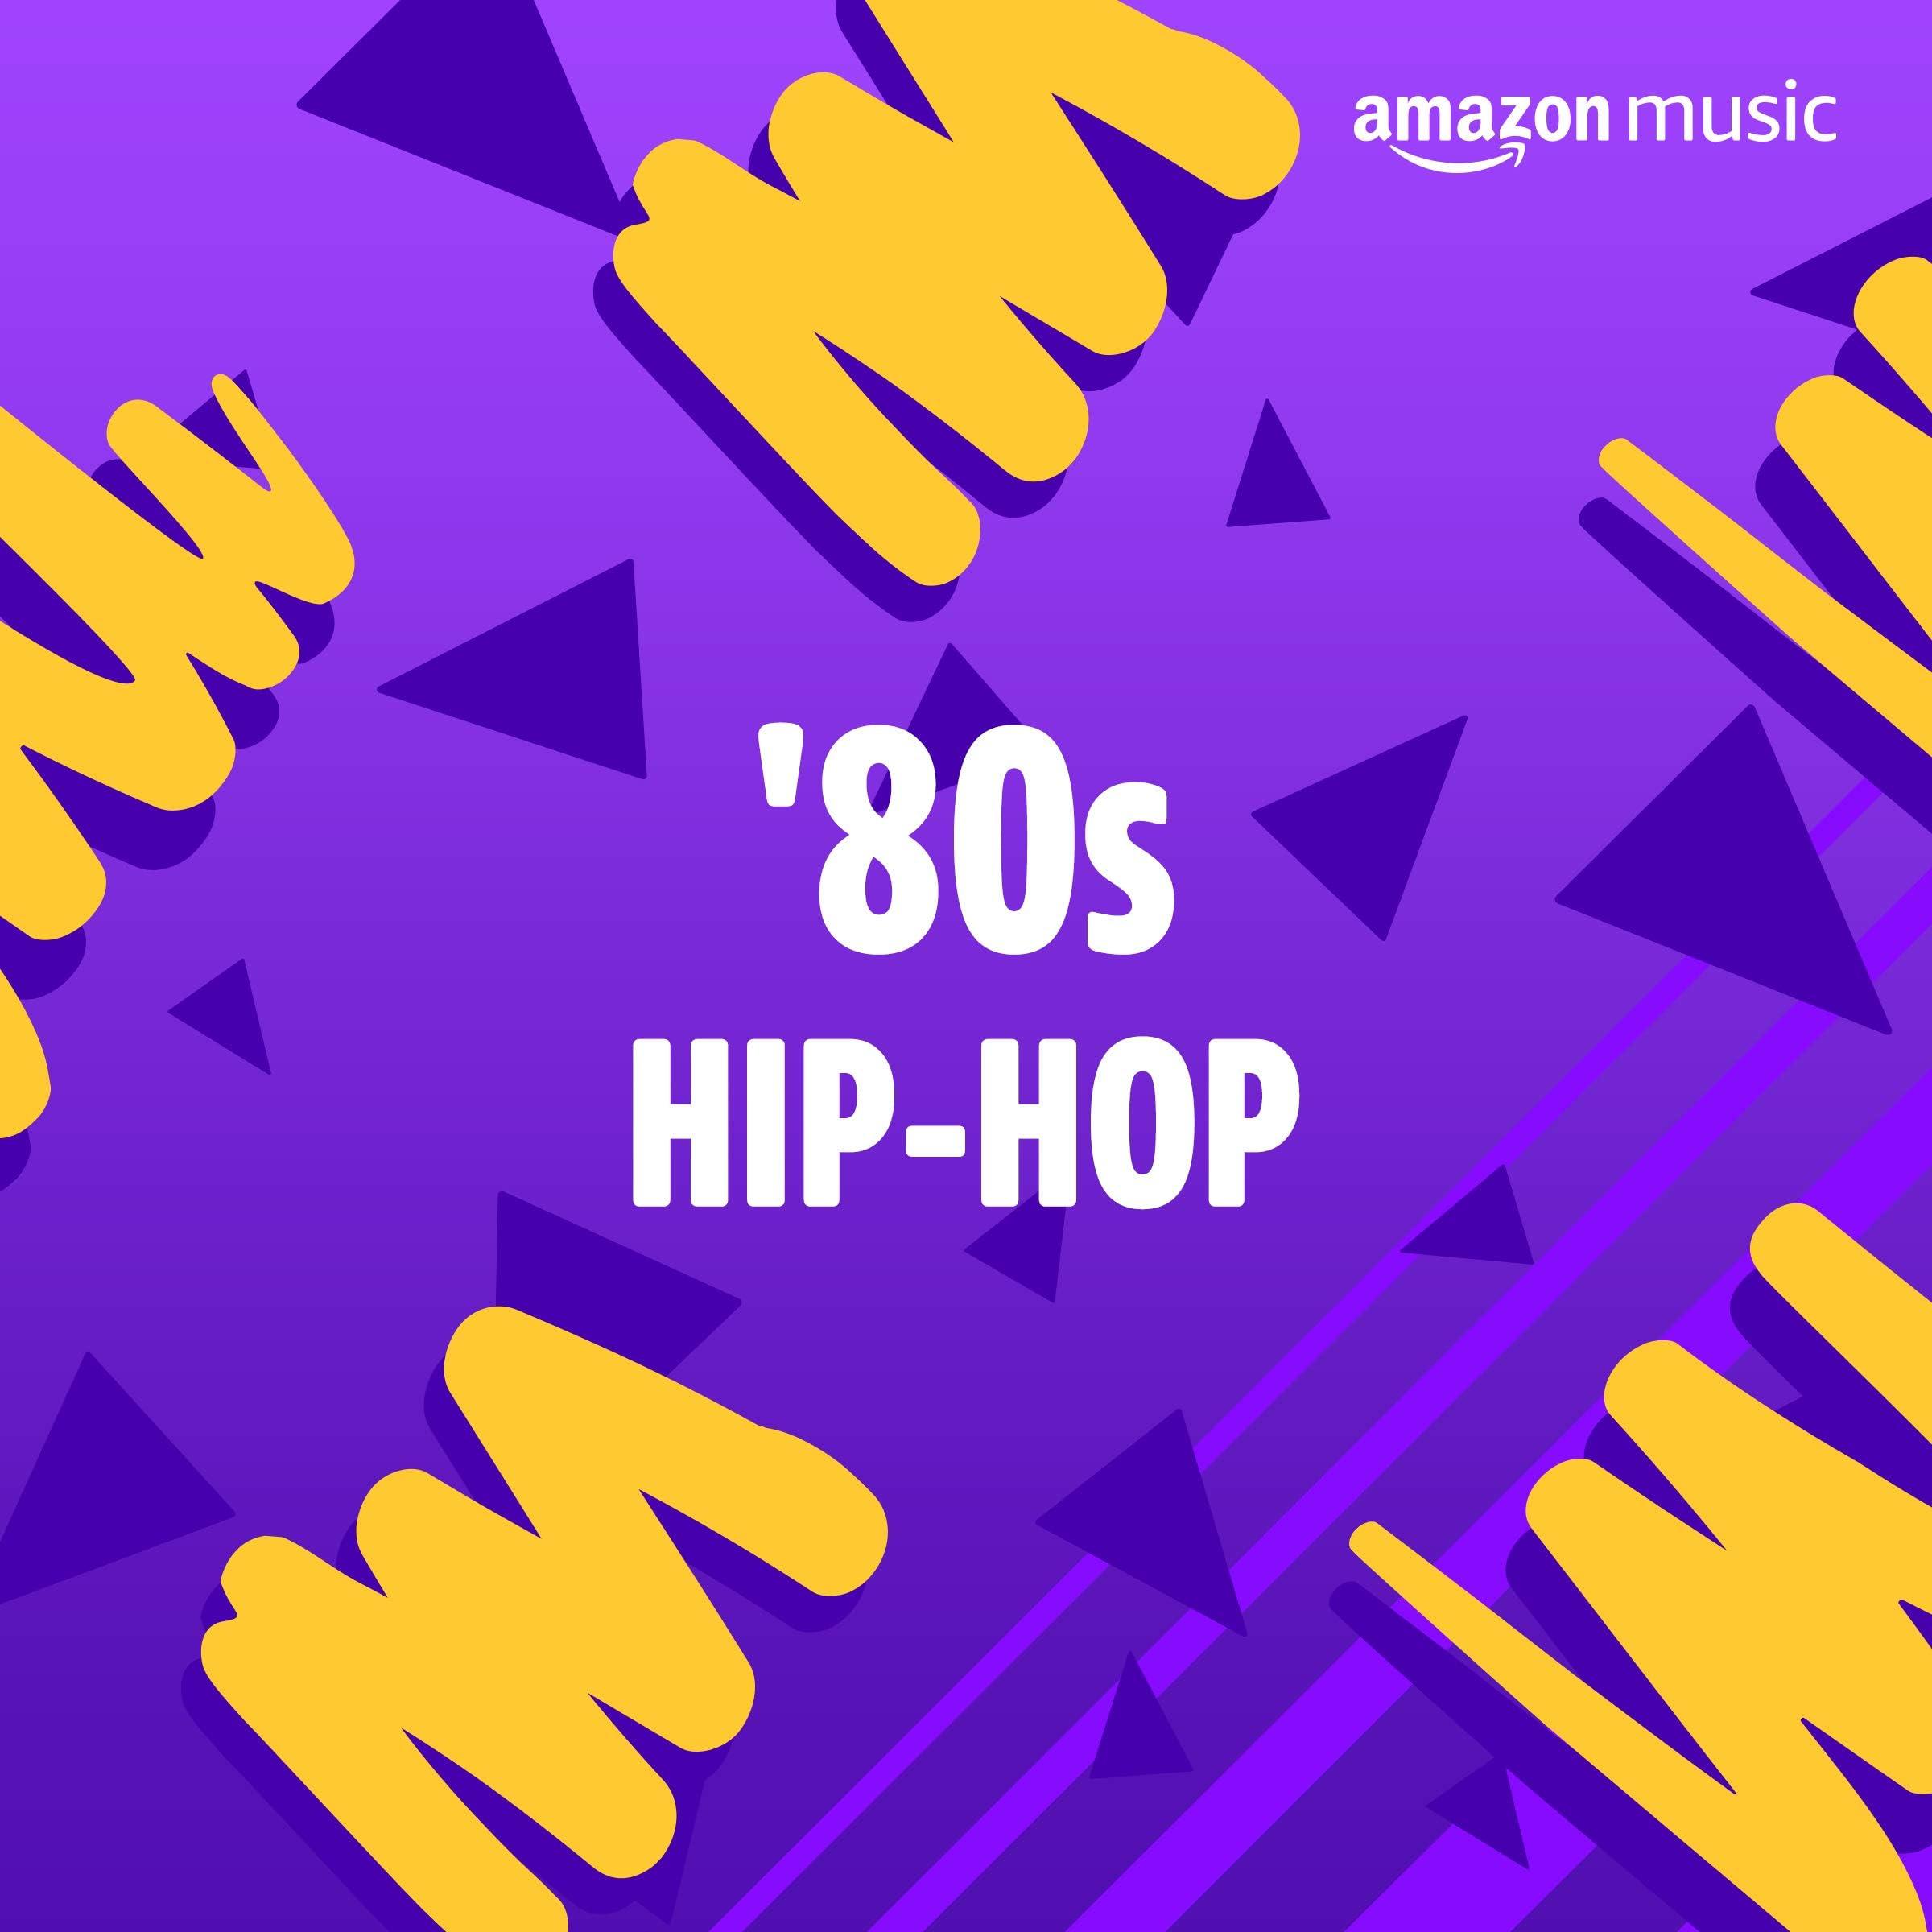 80s Hip-Hop